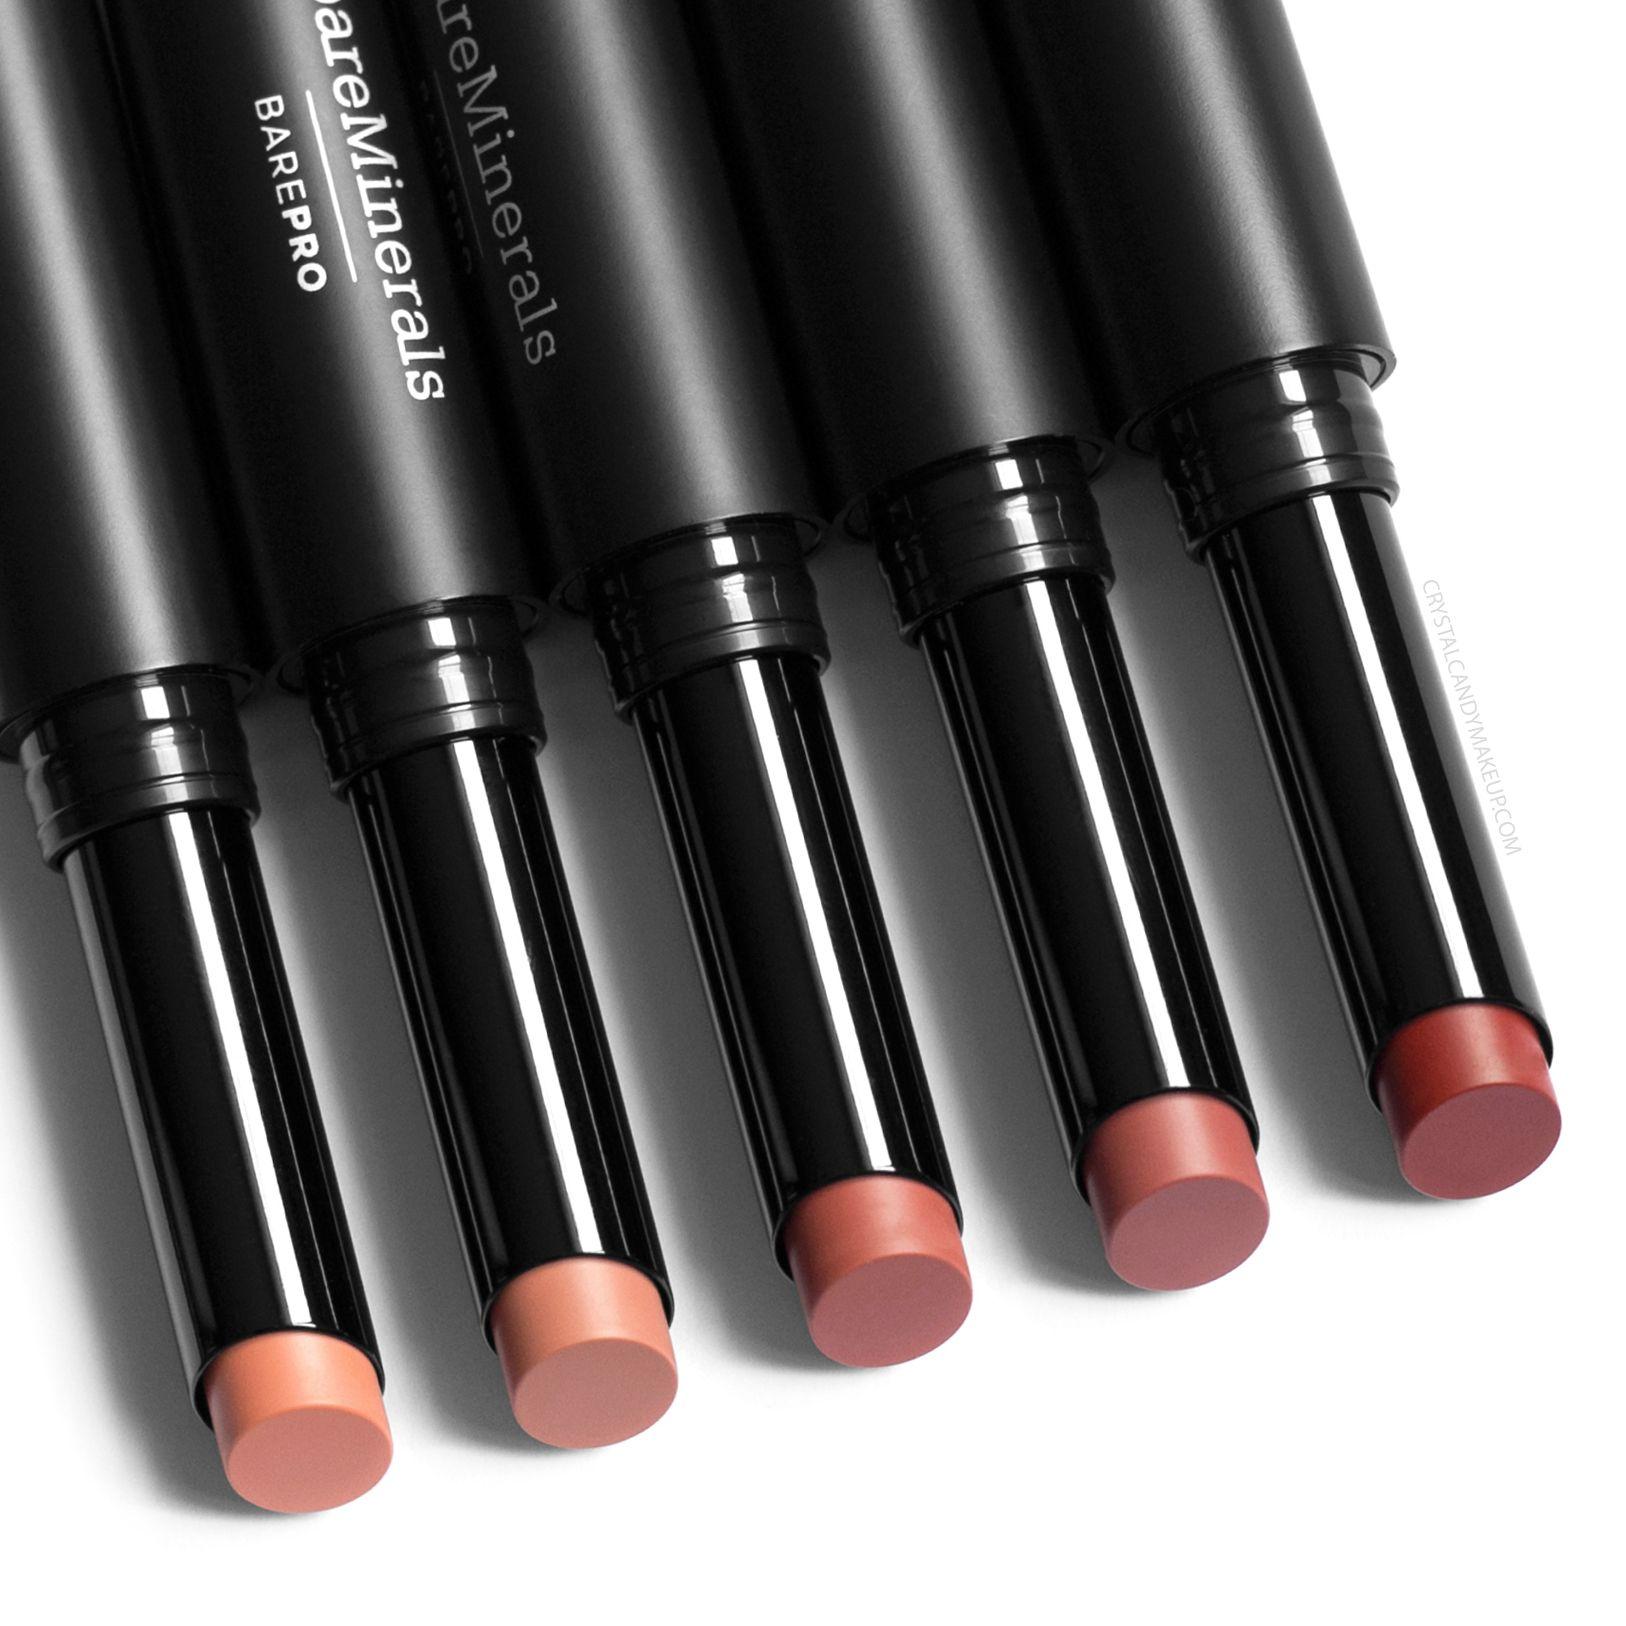 BareMinerals BarePro Longwear Lipsticks Review and